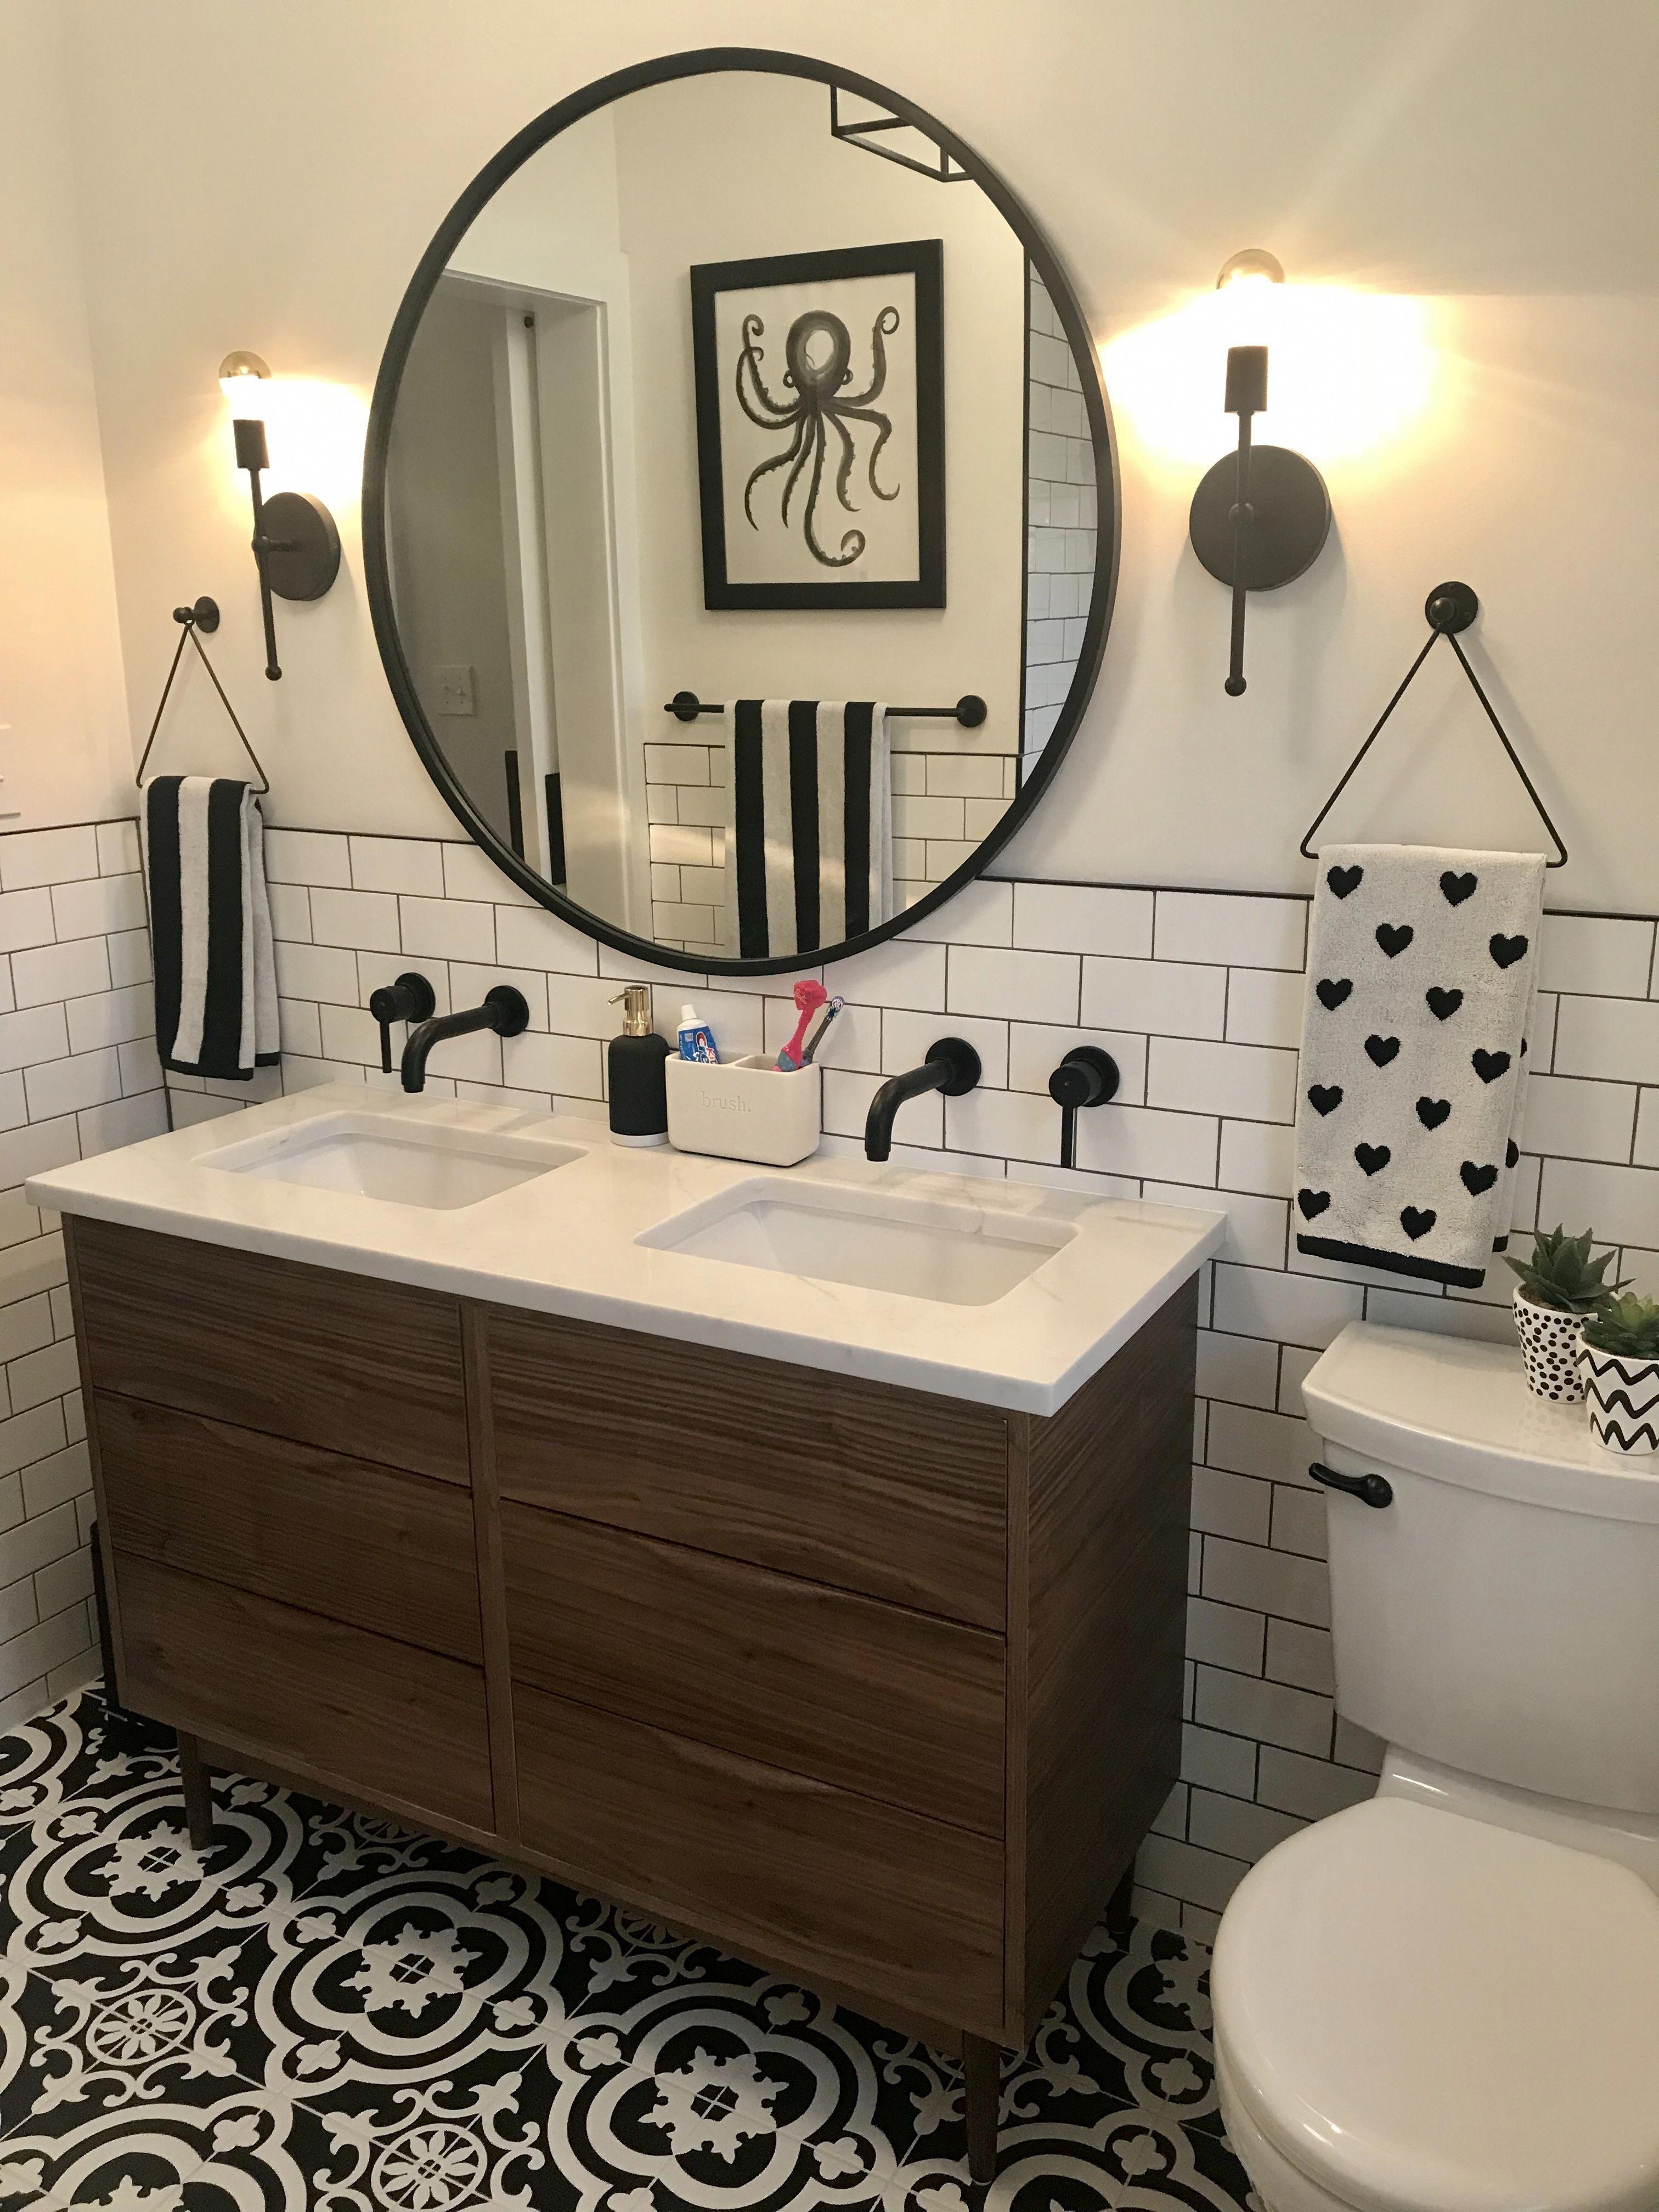 Custom Walnut Vanity Quartz Counter Lowe S Cementina Black And White Floor Subway Tile Large Round Mirr Bathroom Makeover Bathrooms Remodel Bathroom Design White walnut bathroom remodel